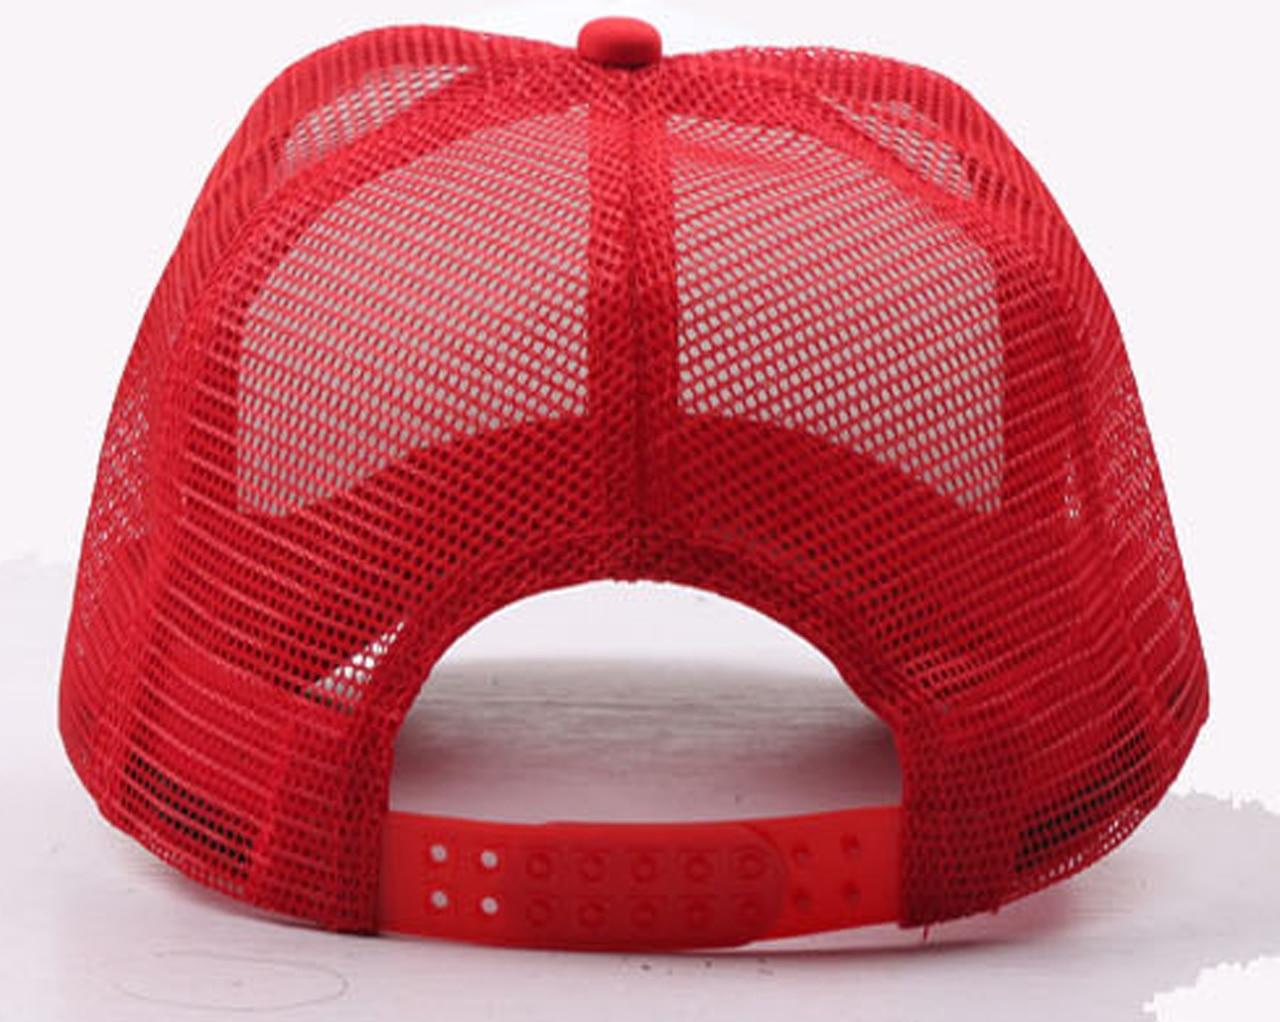 Dutrodu unisex gorras de beisbol malla hacer América gay nuevo color del  arco iris logo sombrero gorras hip hop sombrero Vary colores relaxbale en  Gorras de ... 64d5368af7a